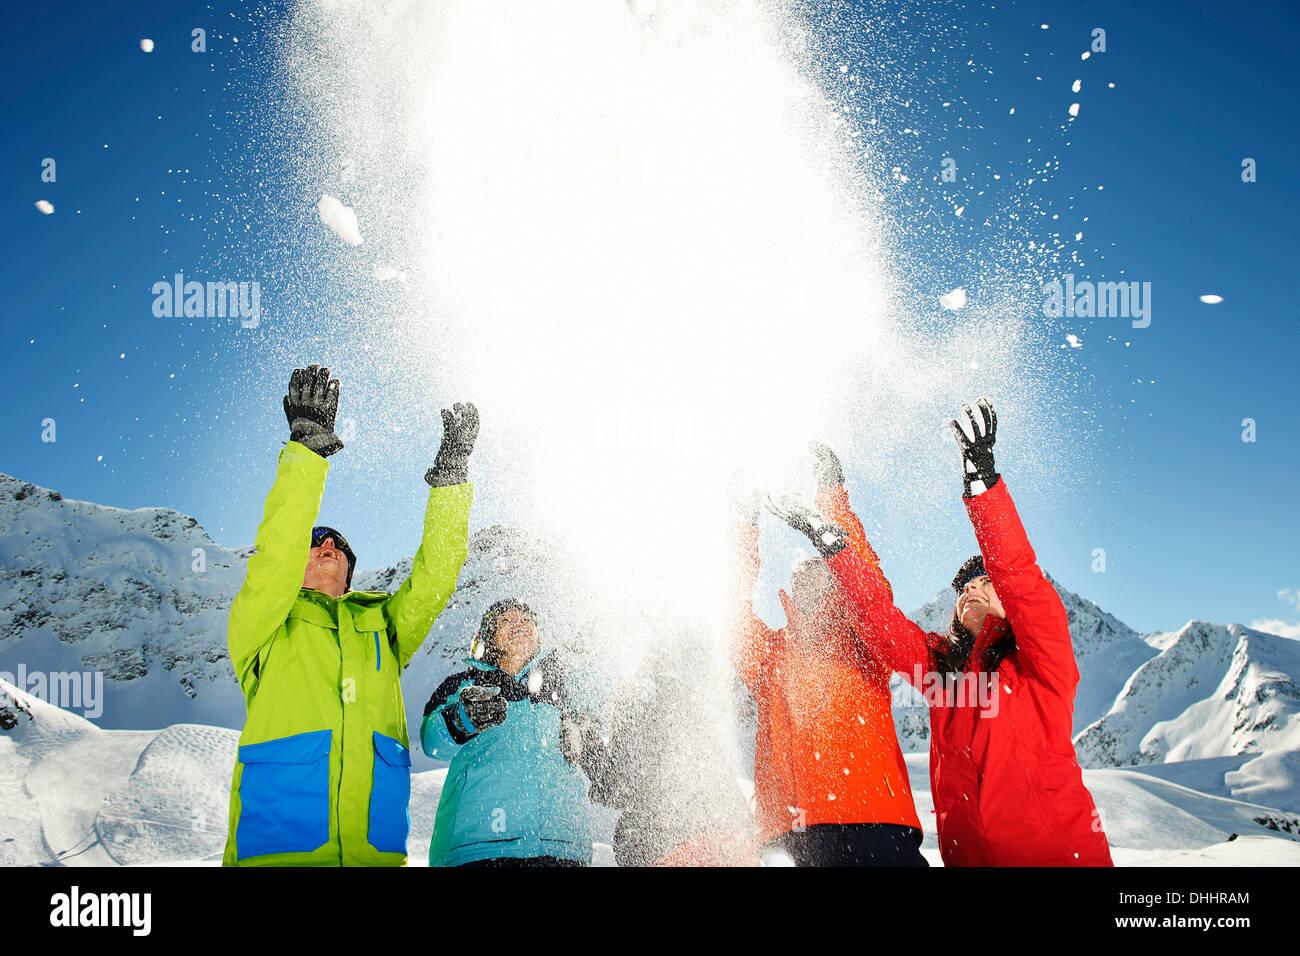 Friends throwing snow mid air, Kuhtai, Austria - Stock Image